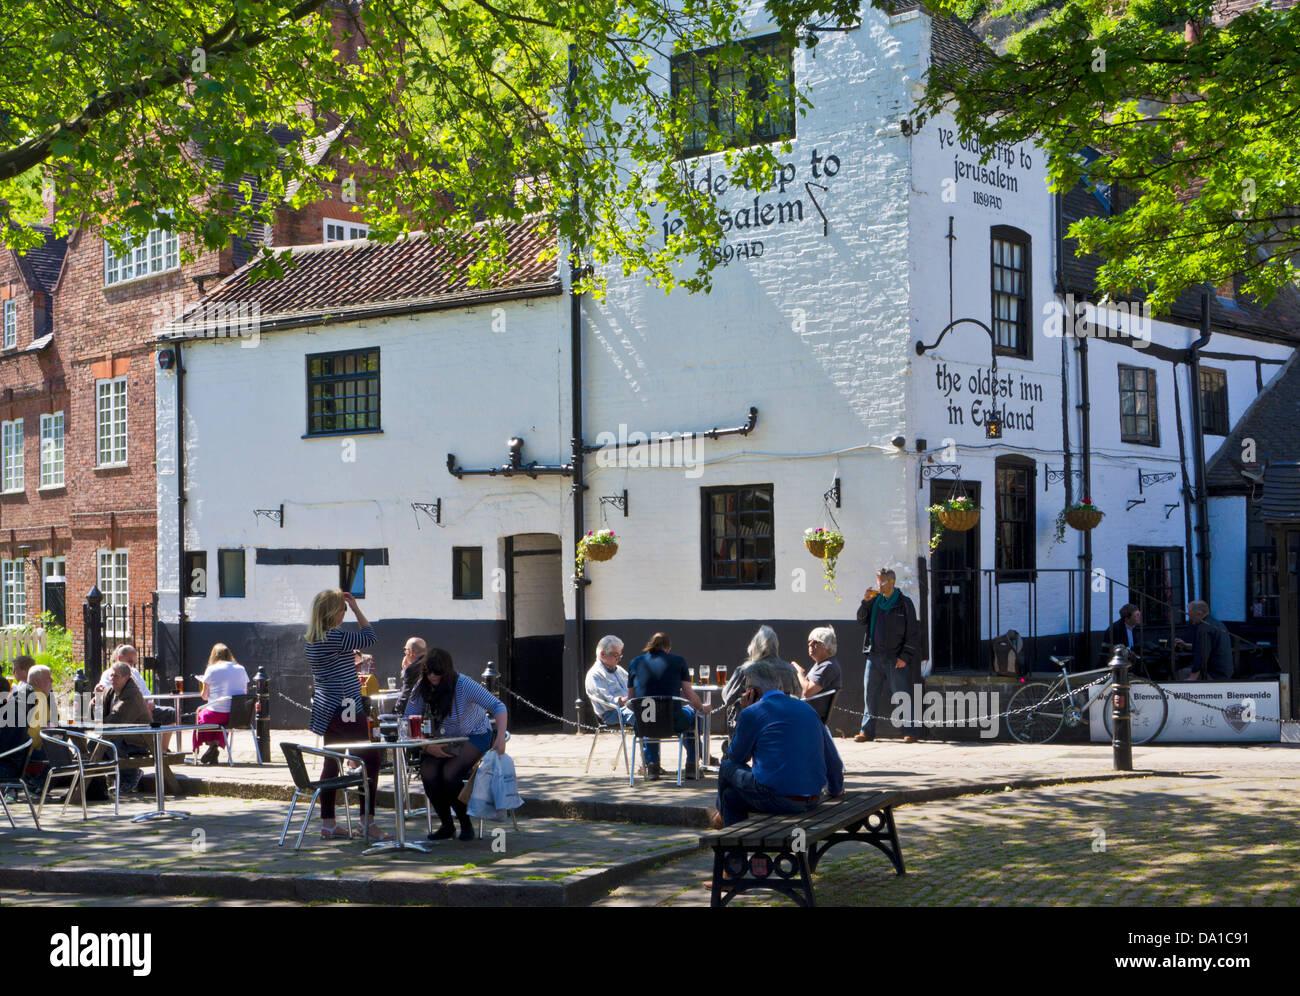 Ye Olde viaje a Jerusalén pub en el centro de la ciudad de Nottingham Inglaterra Nottinghamshire GB Europa Imagen De Stock